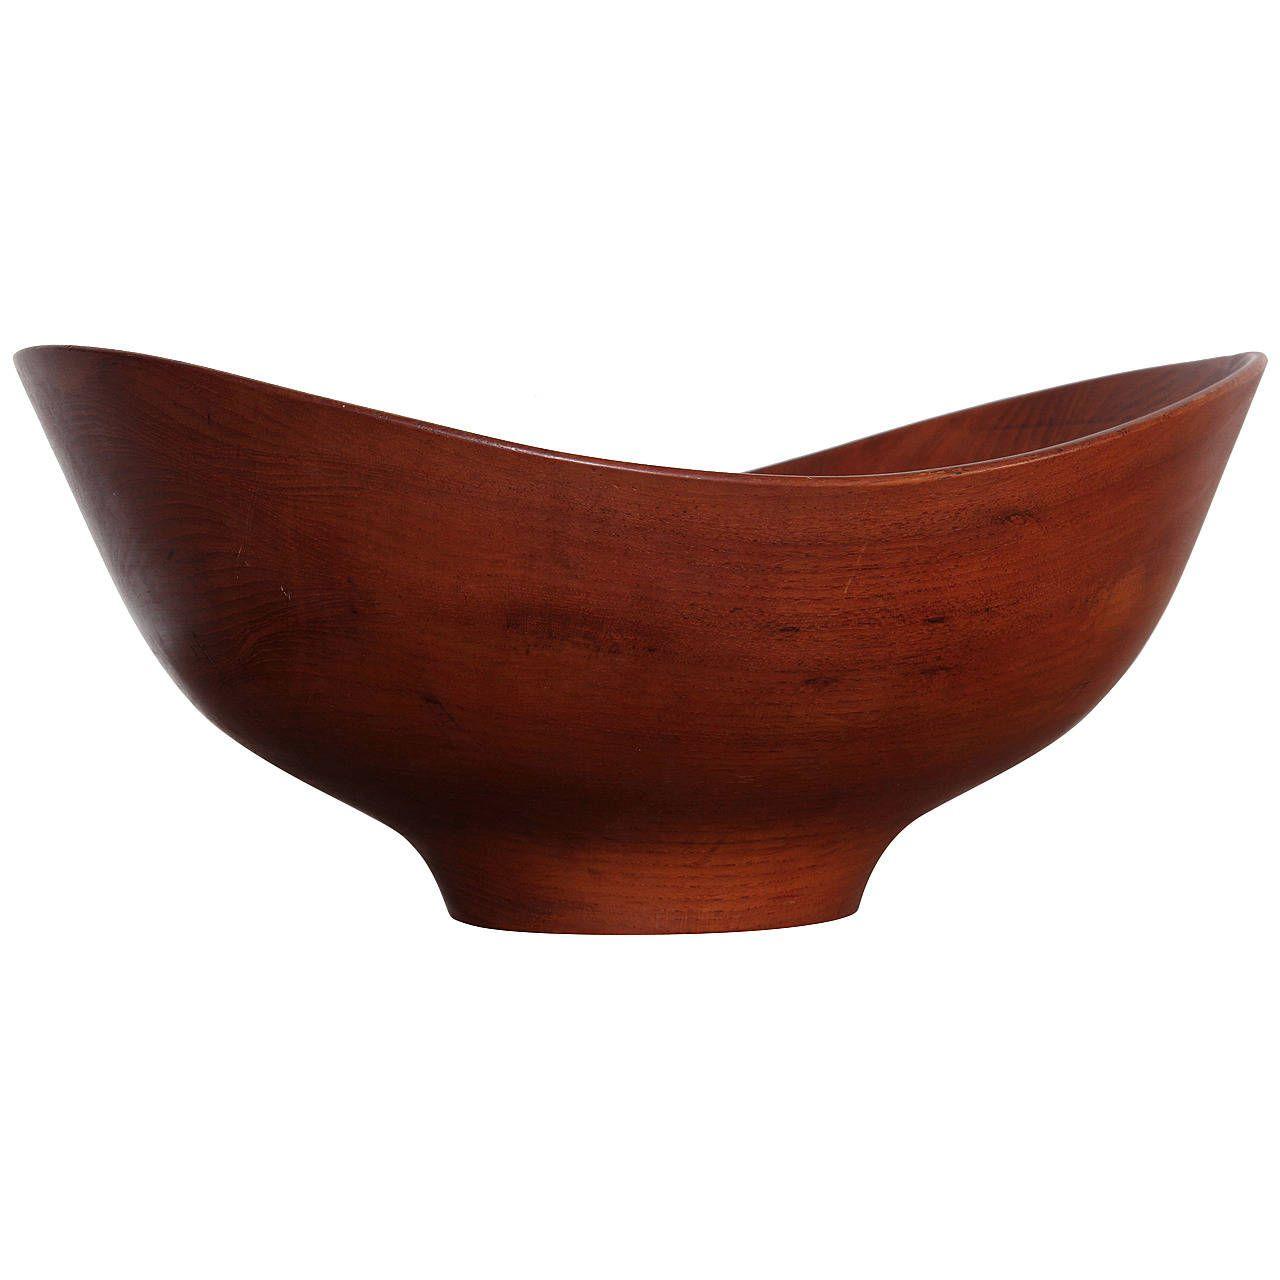 Unique Decorative Bowls Large Teak Bowlfinn Juhl  Teak Bowls And Decorative Objects